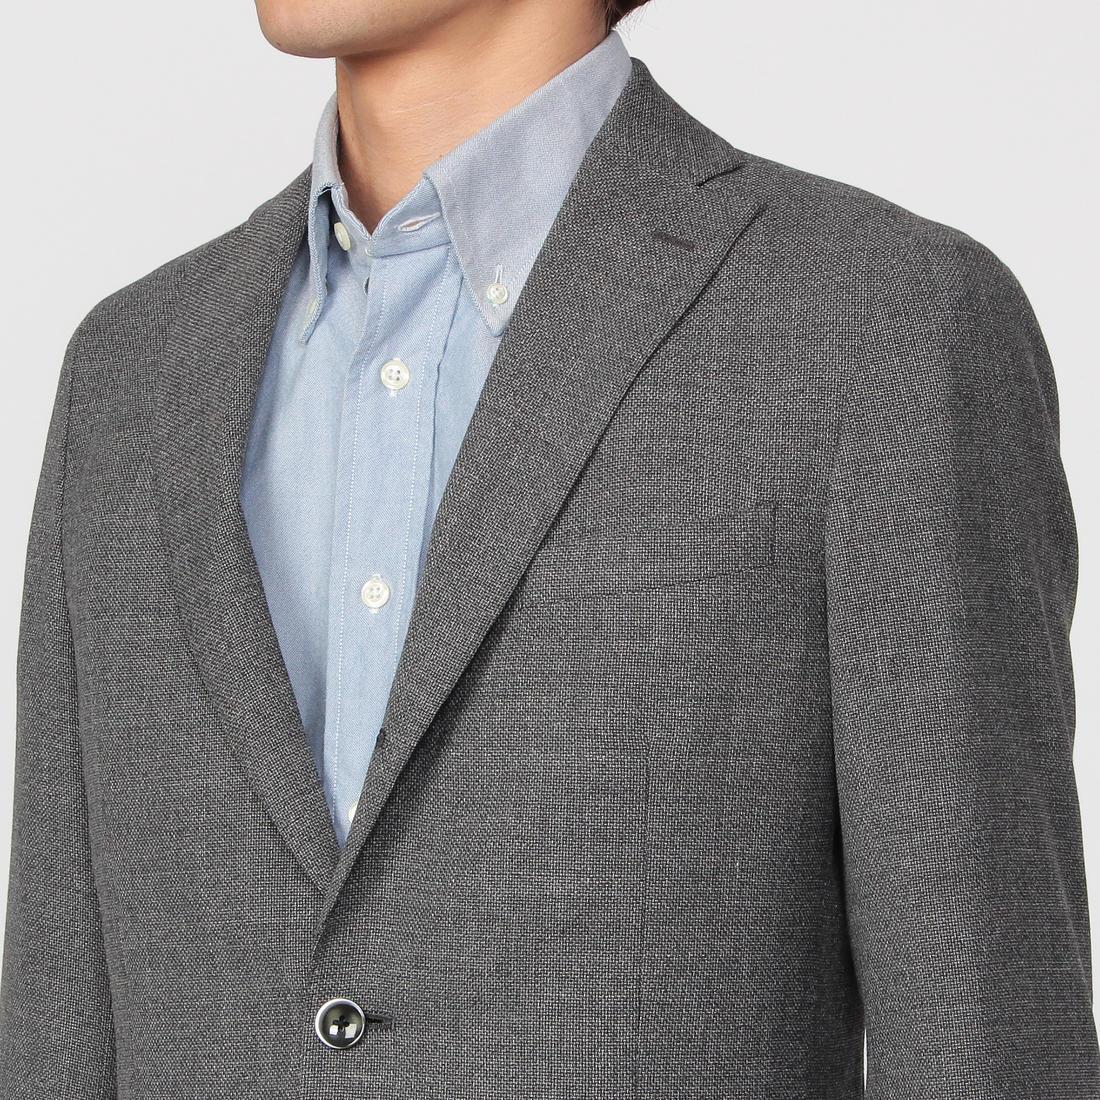 Reda Icesense Wool 3-button Jacket 1159150: Gray